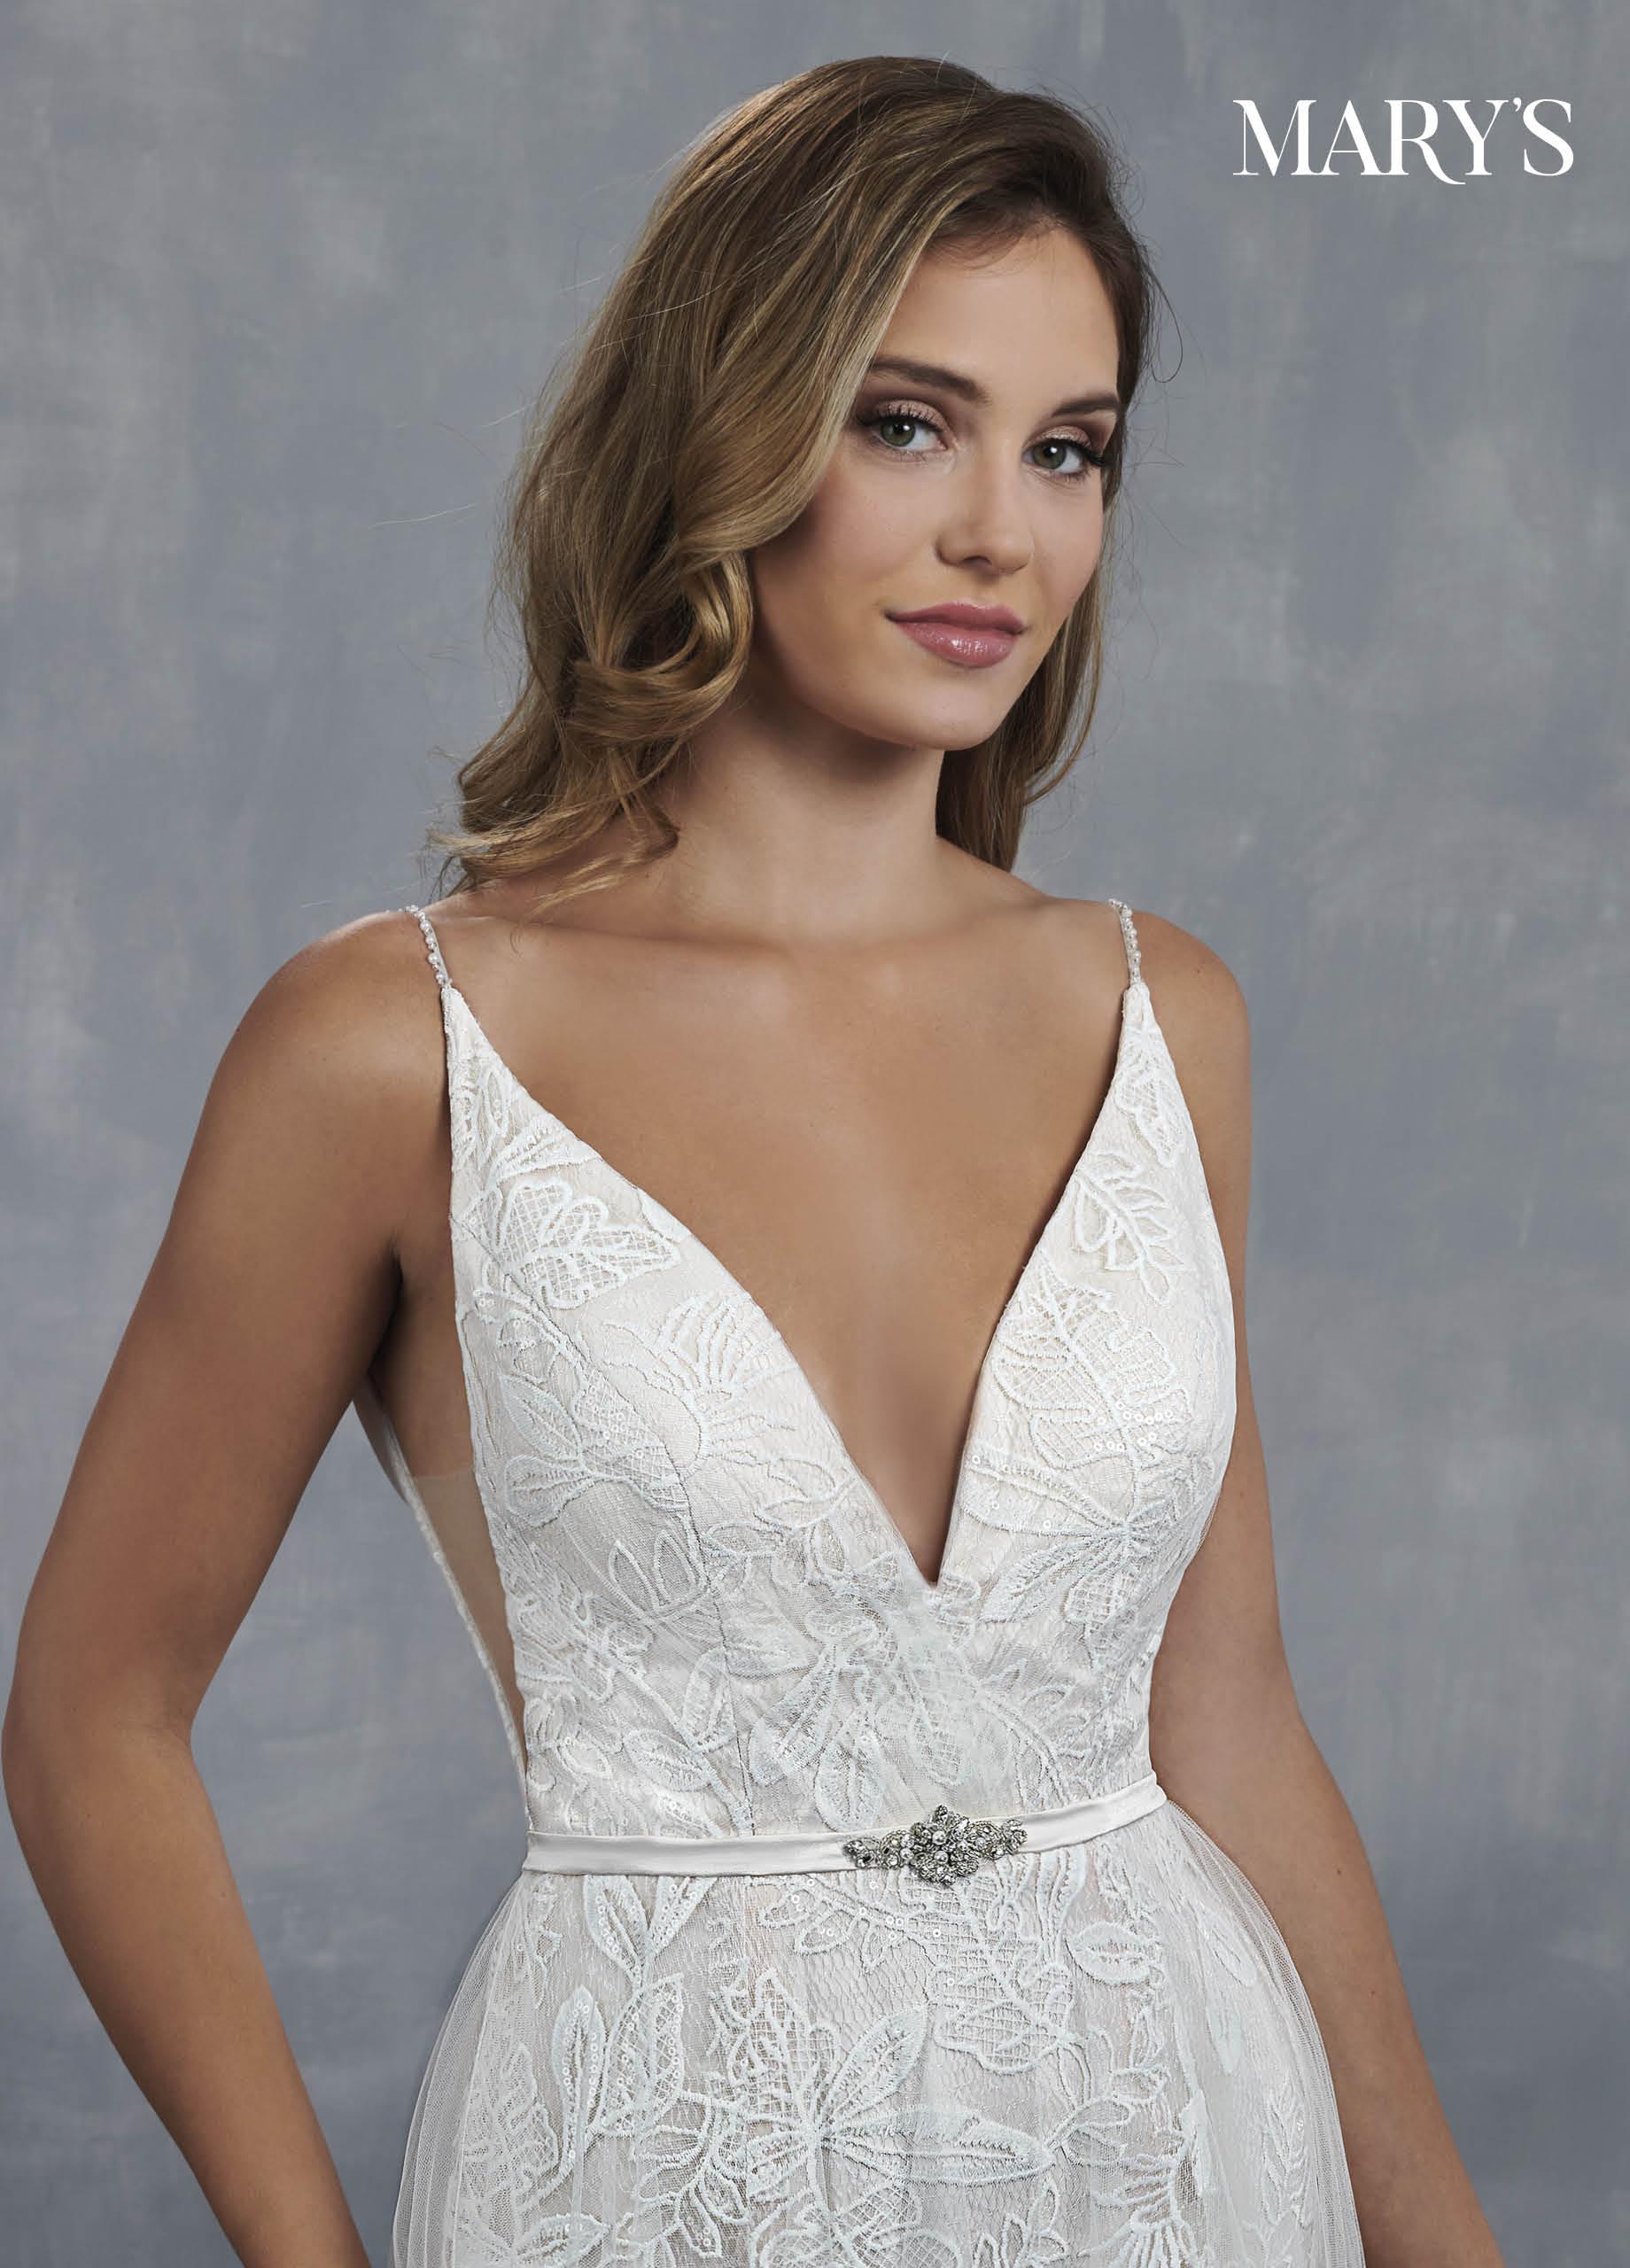 Bridal Wedding Dresses | Mary's | Style - MB3052